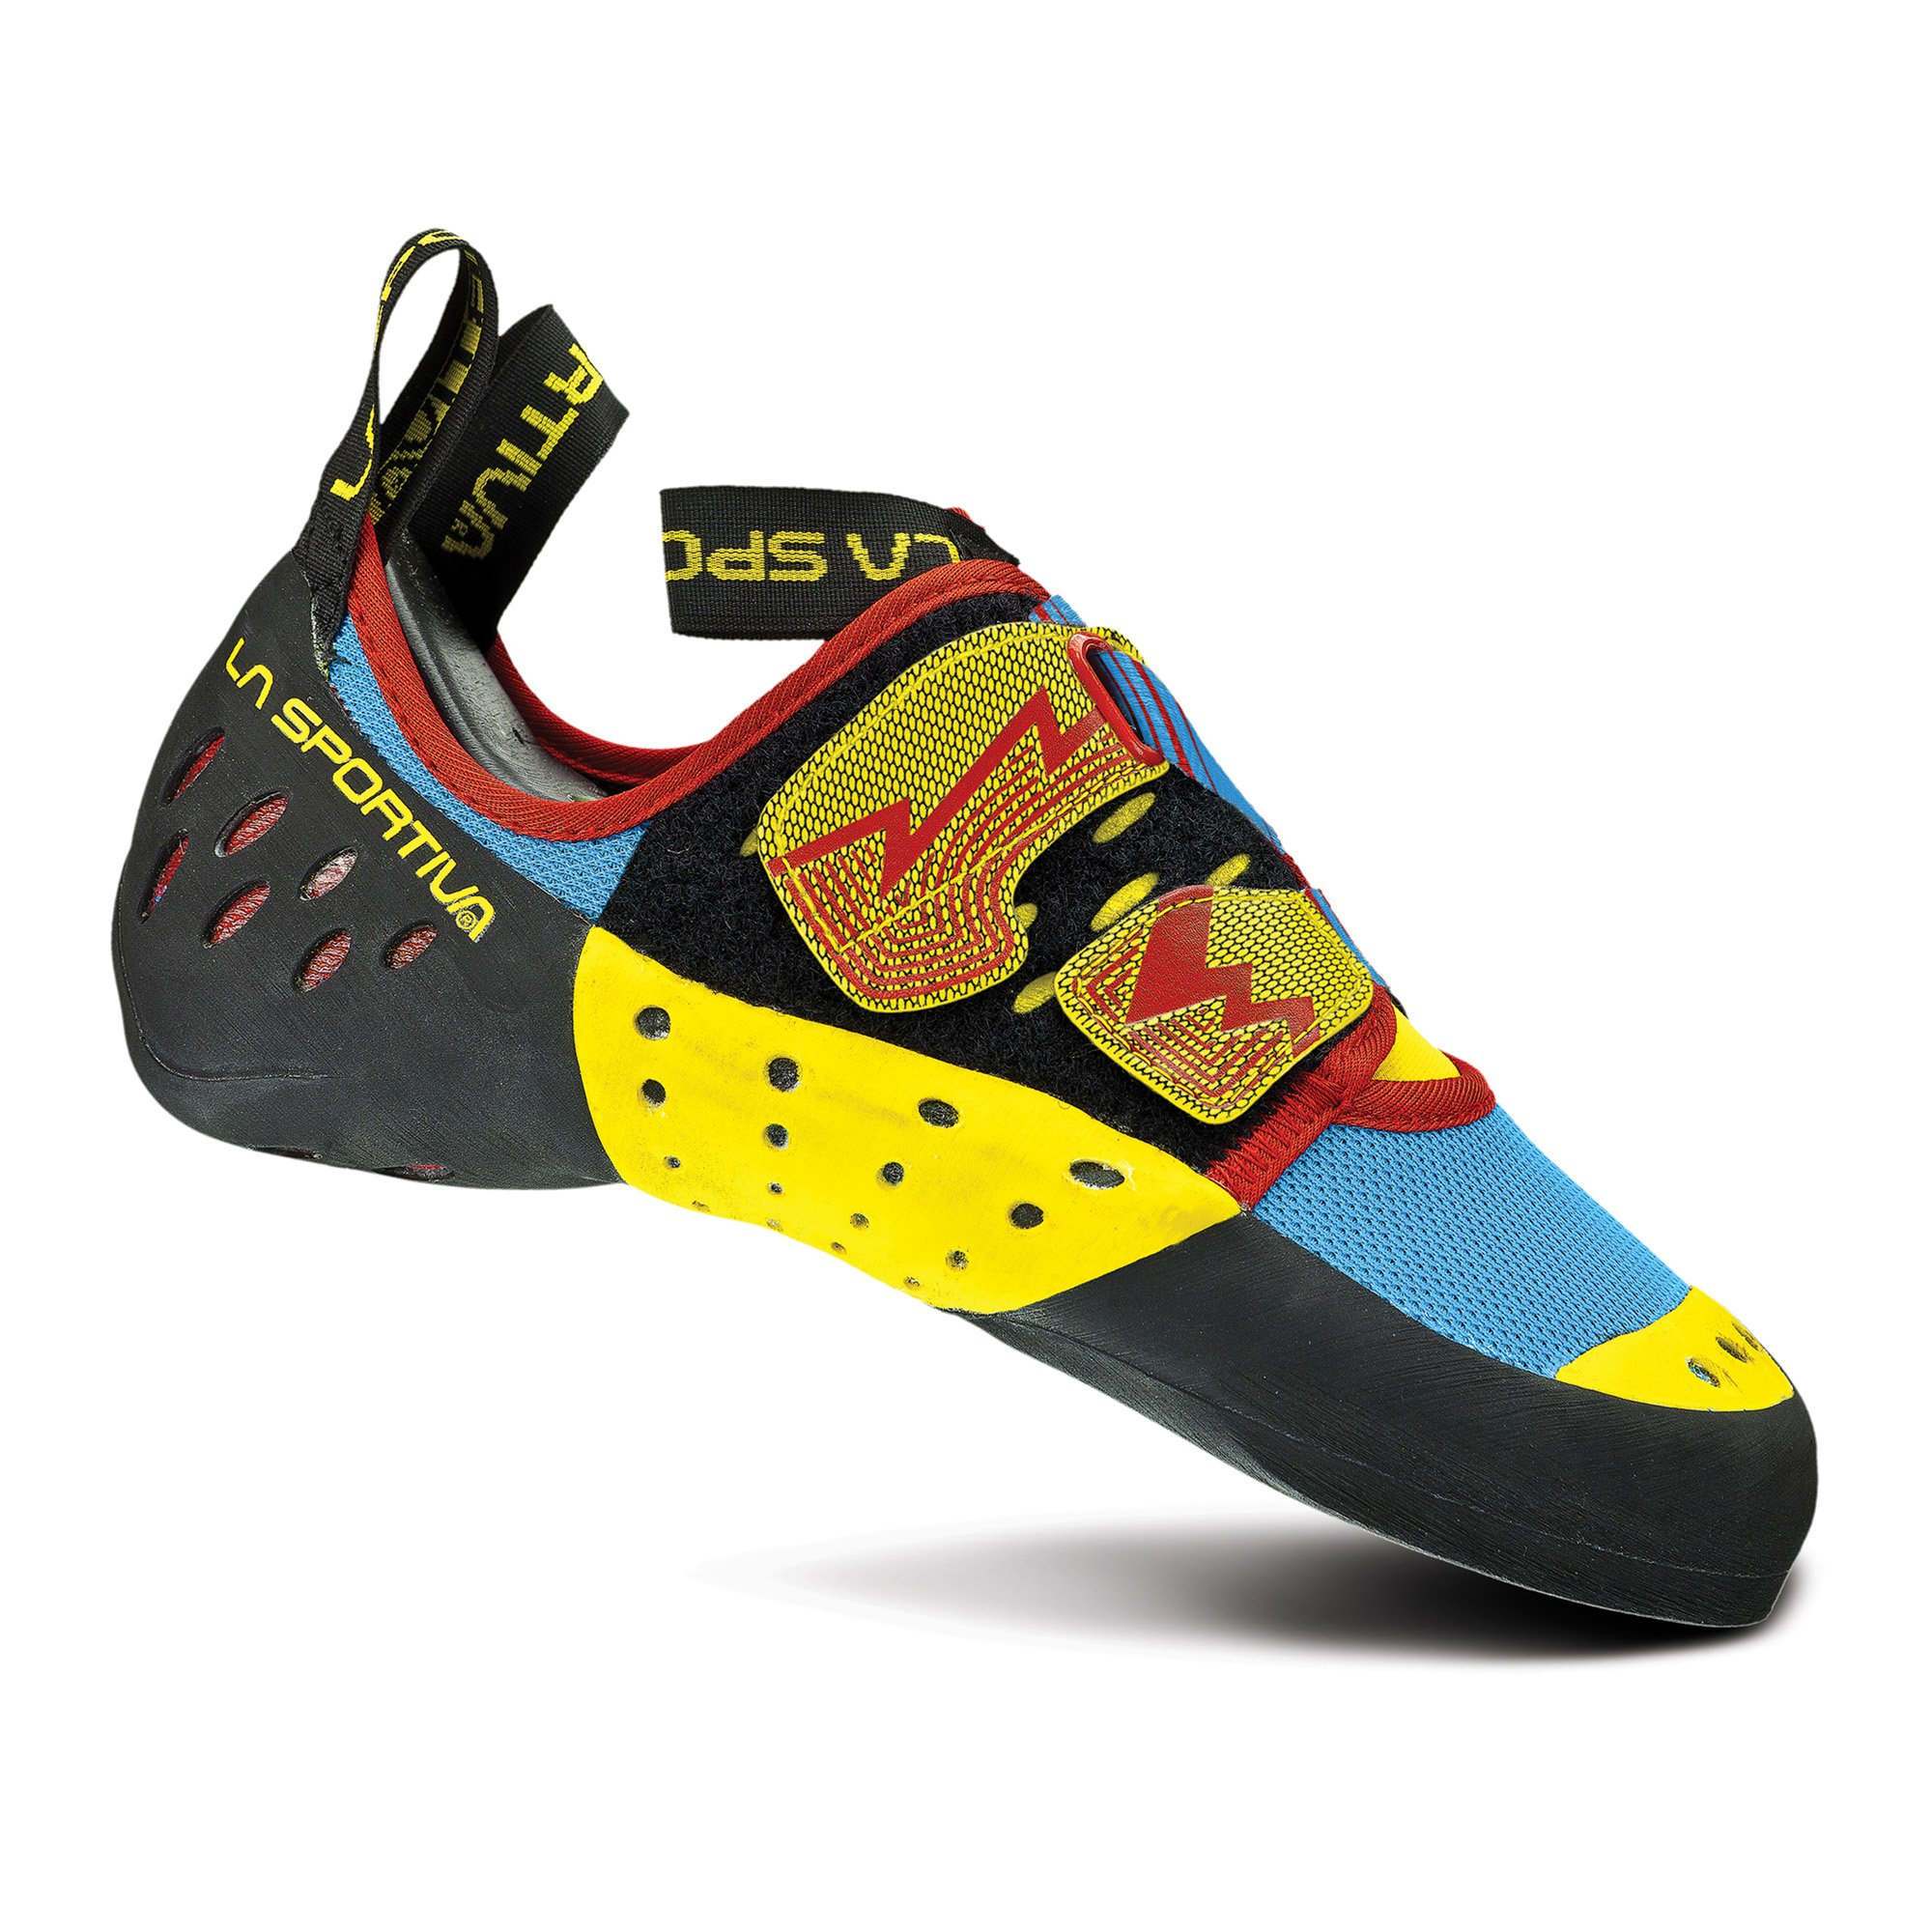 La Sportiva Oxygym Climbing Shoe - Men's Blue/Red 43.5